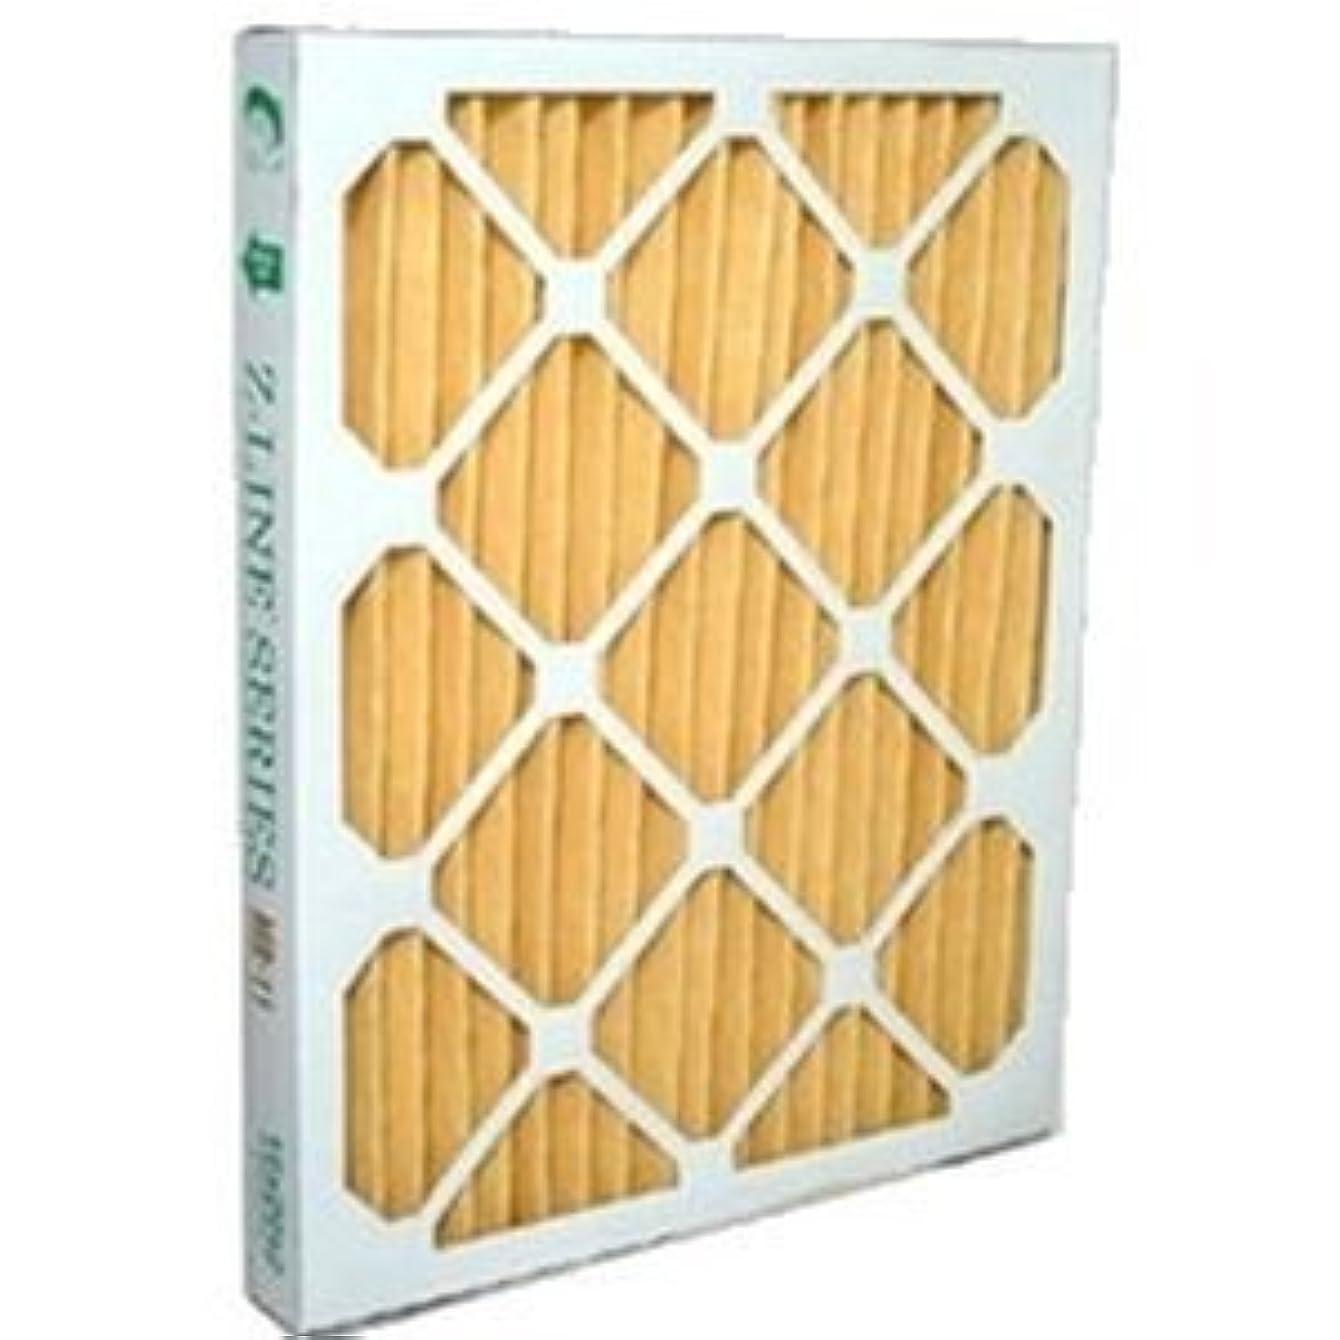 20x20x1 Merv 11 Furnace Filter (12 Pack)